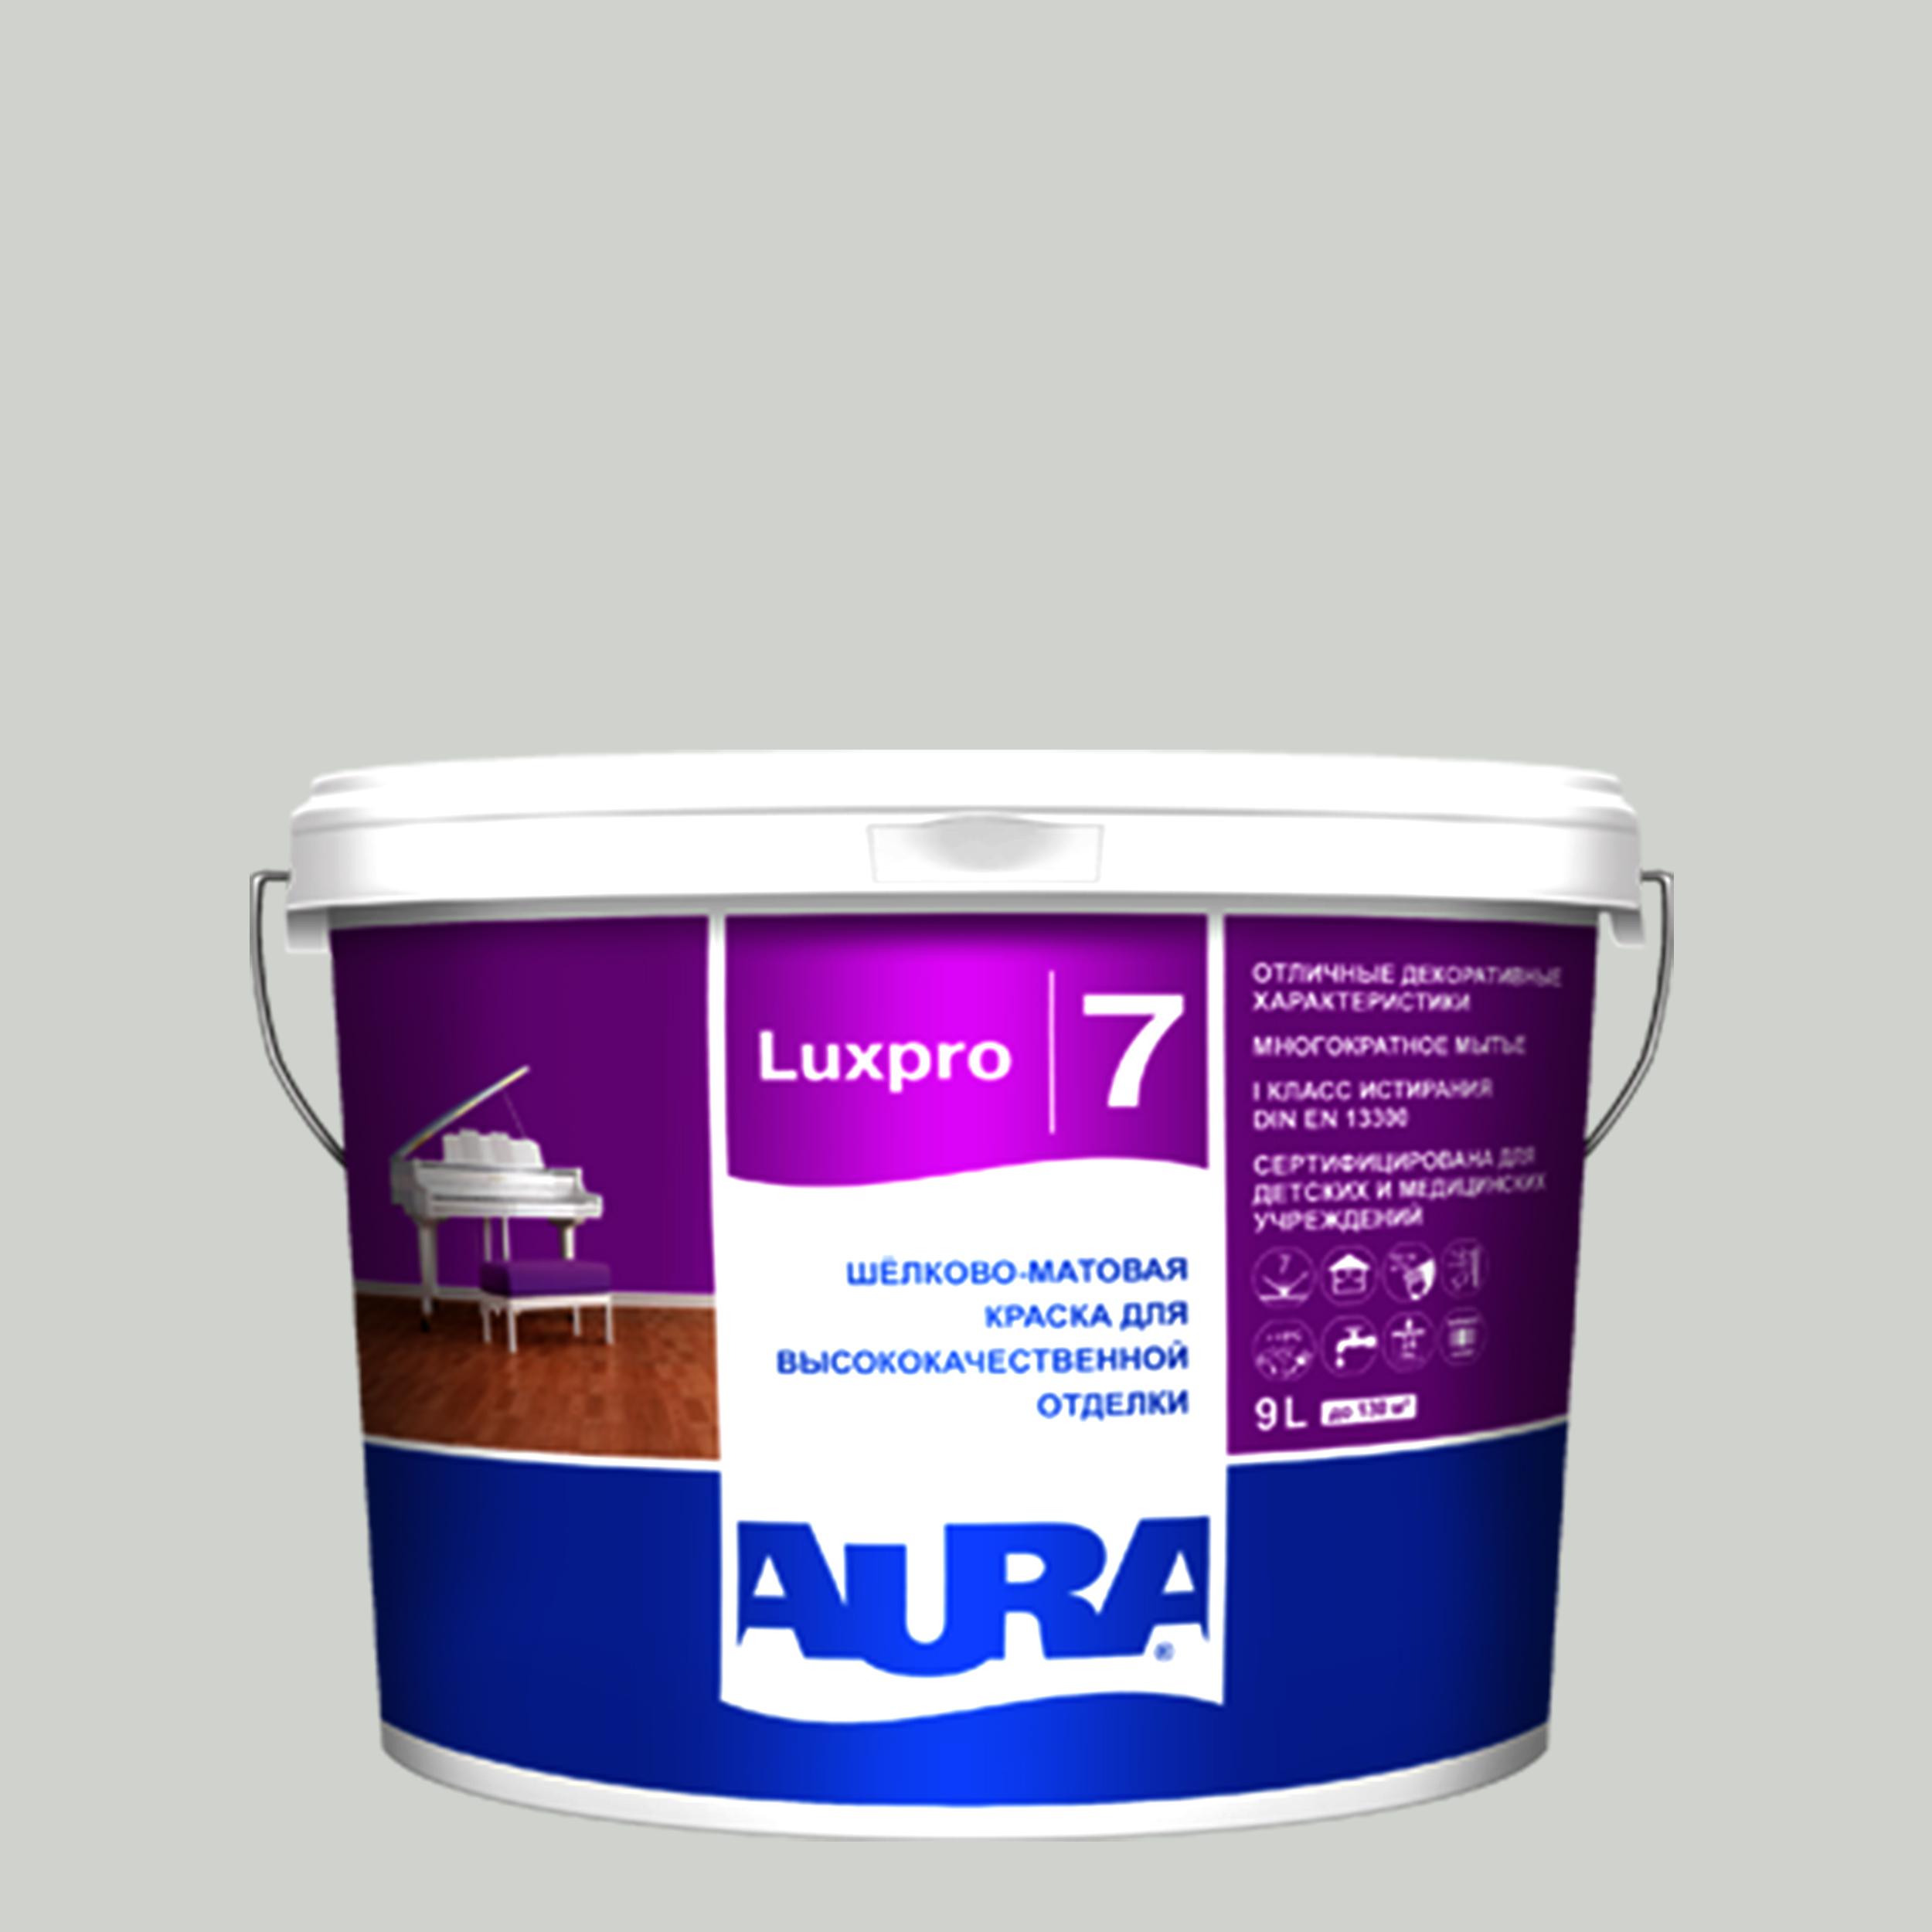 Фото 4 - Краска интерьерная, Aura LuxPRO 7, RAL 3001, 11 кг.